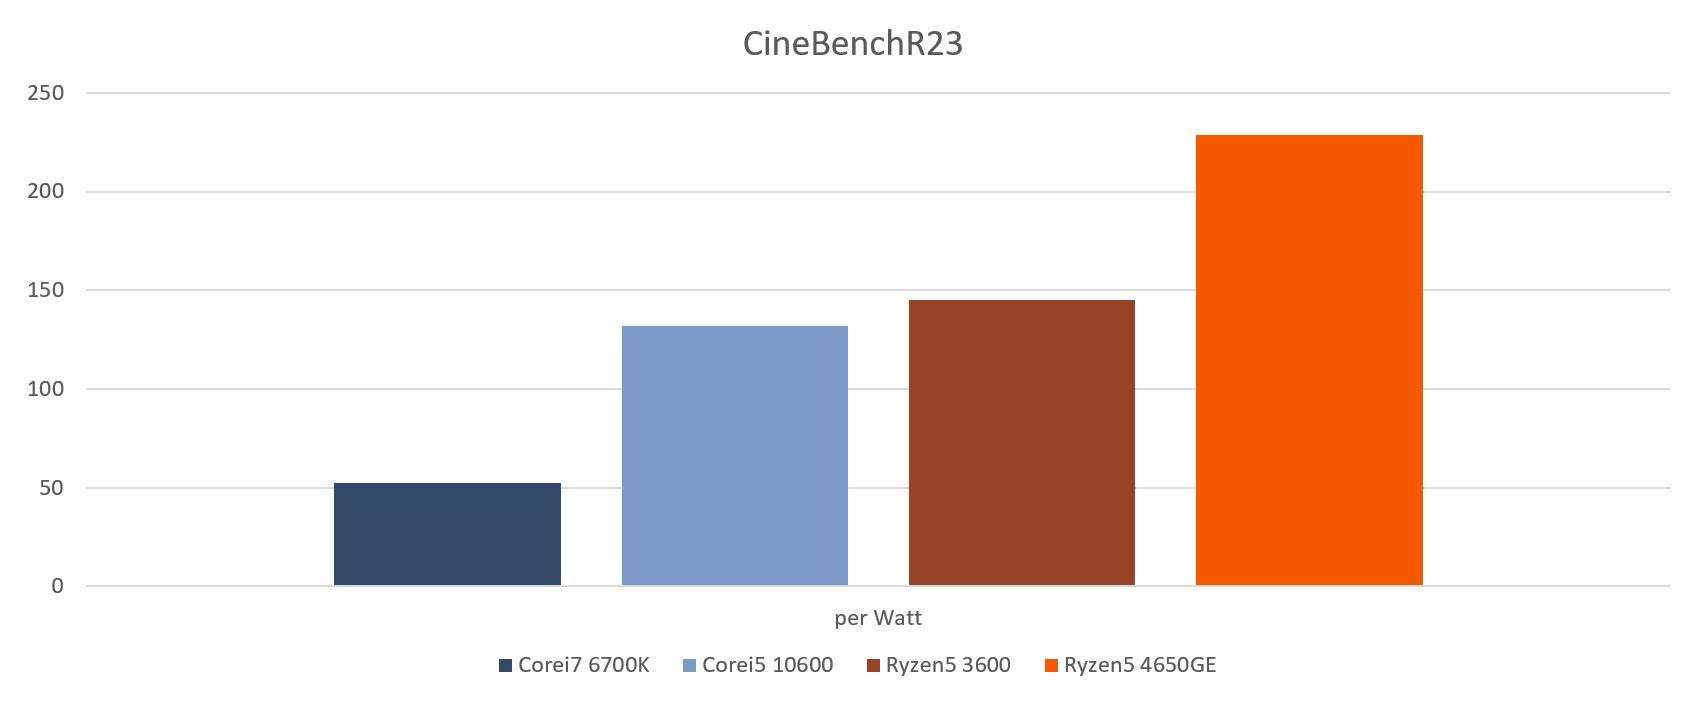 cinebenchR23_perwatt